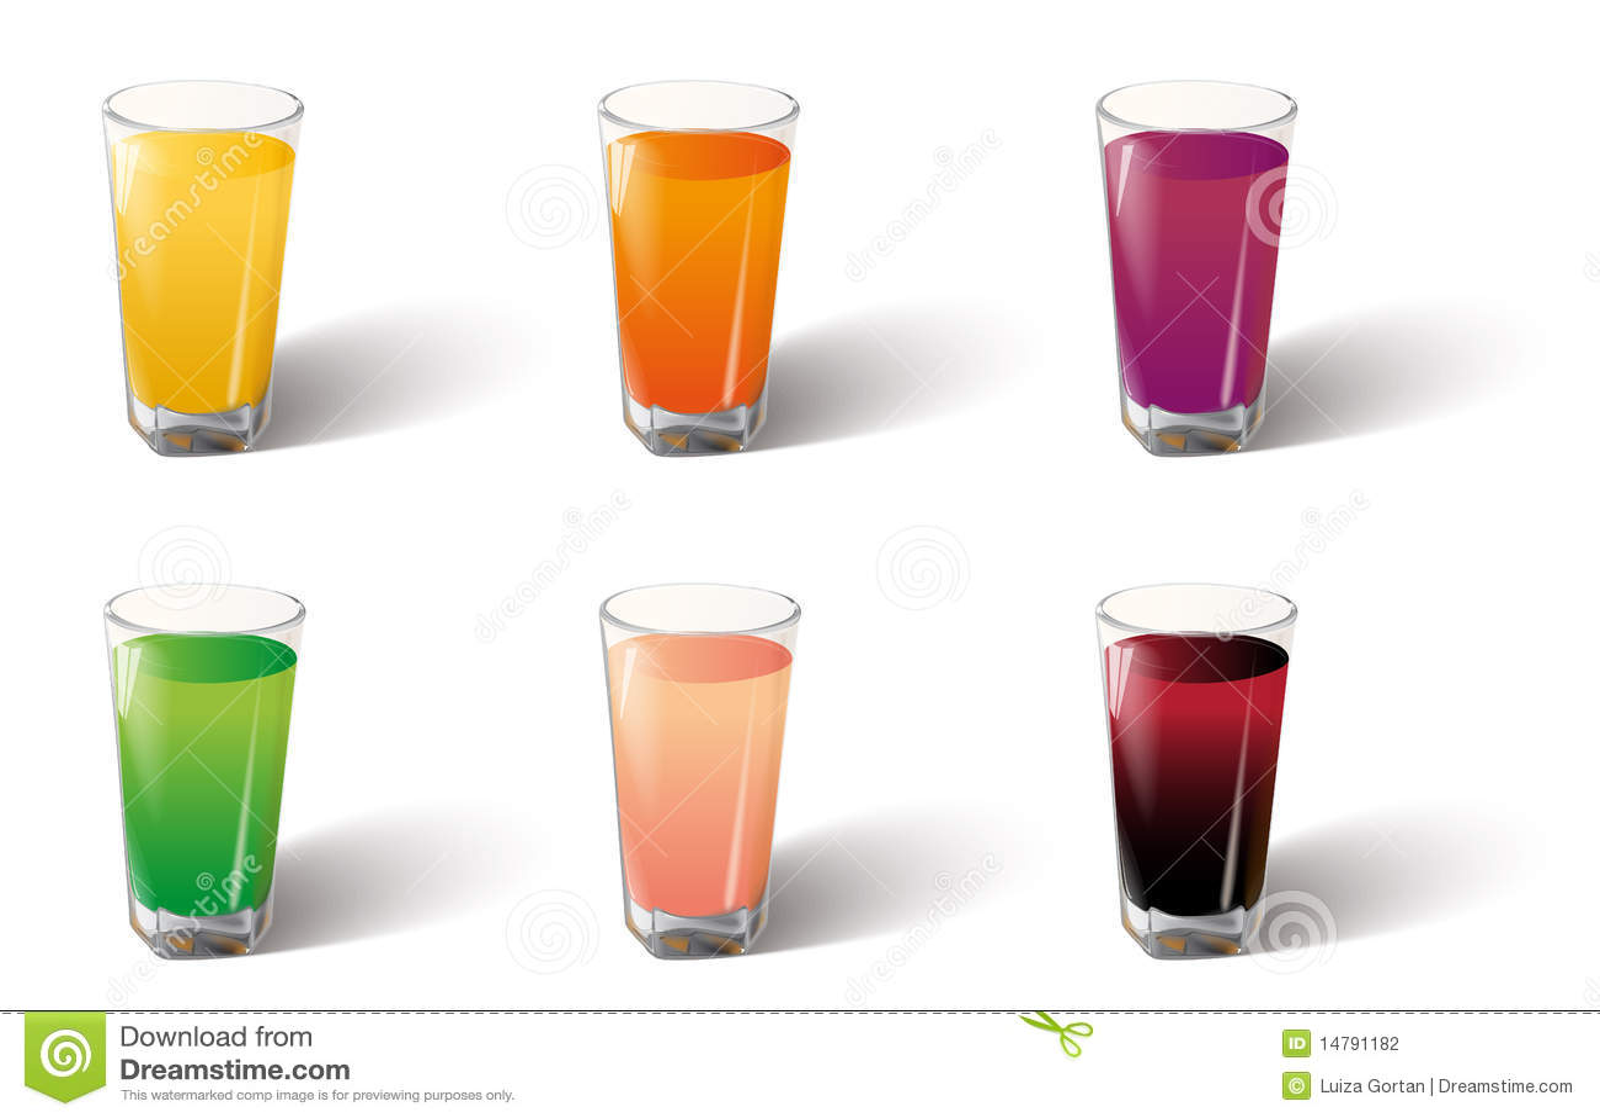 Nature S Juice Prices